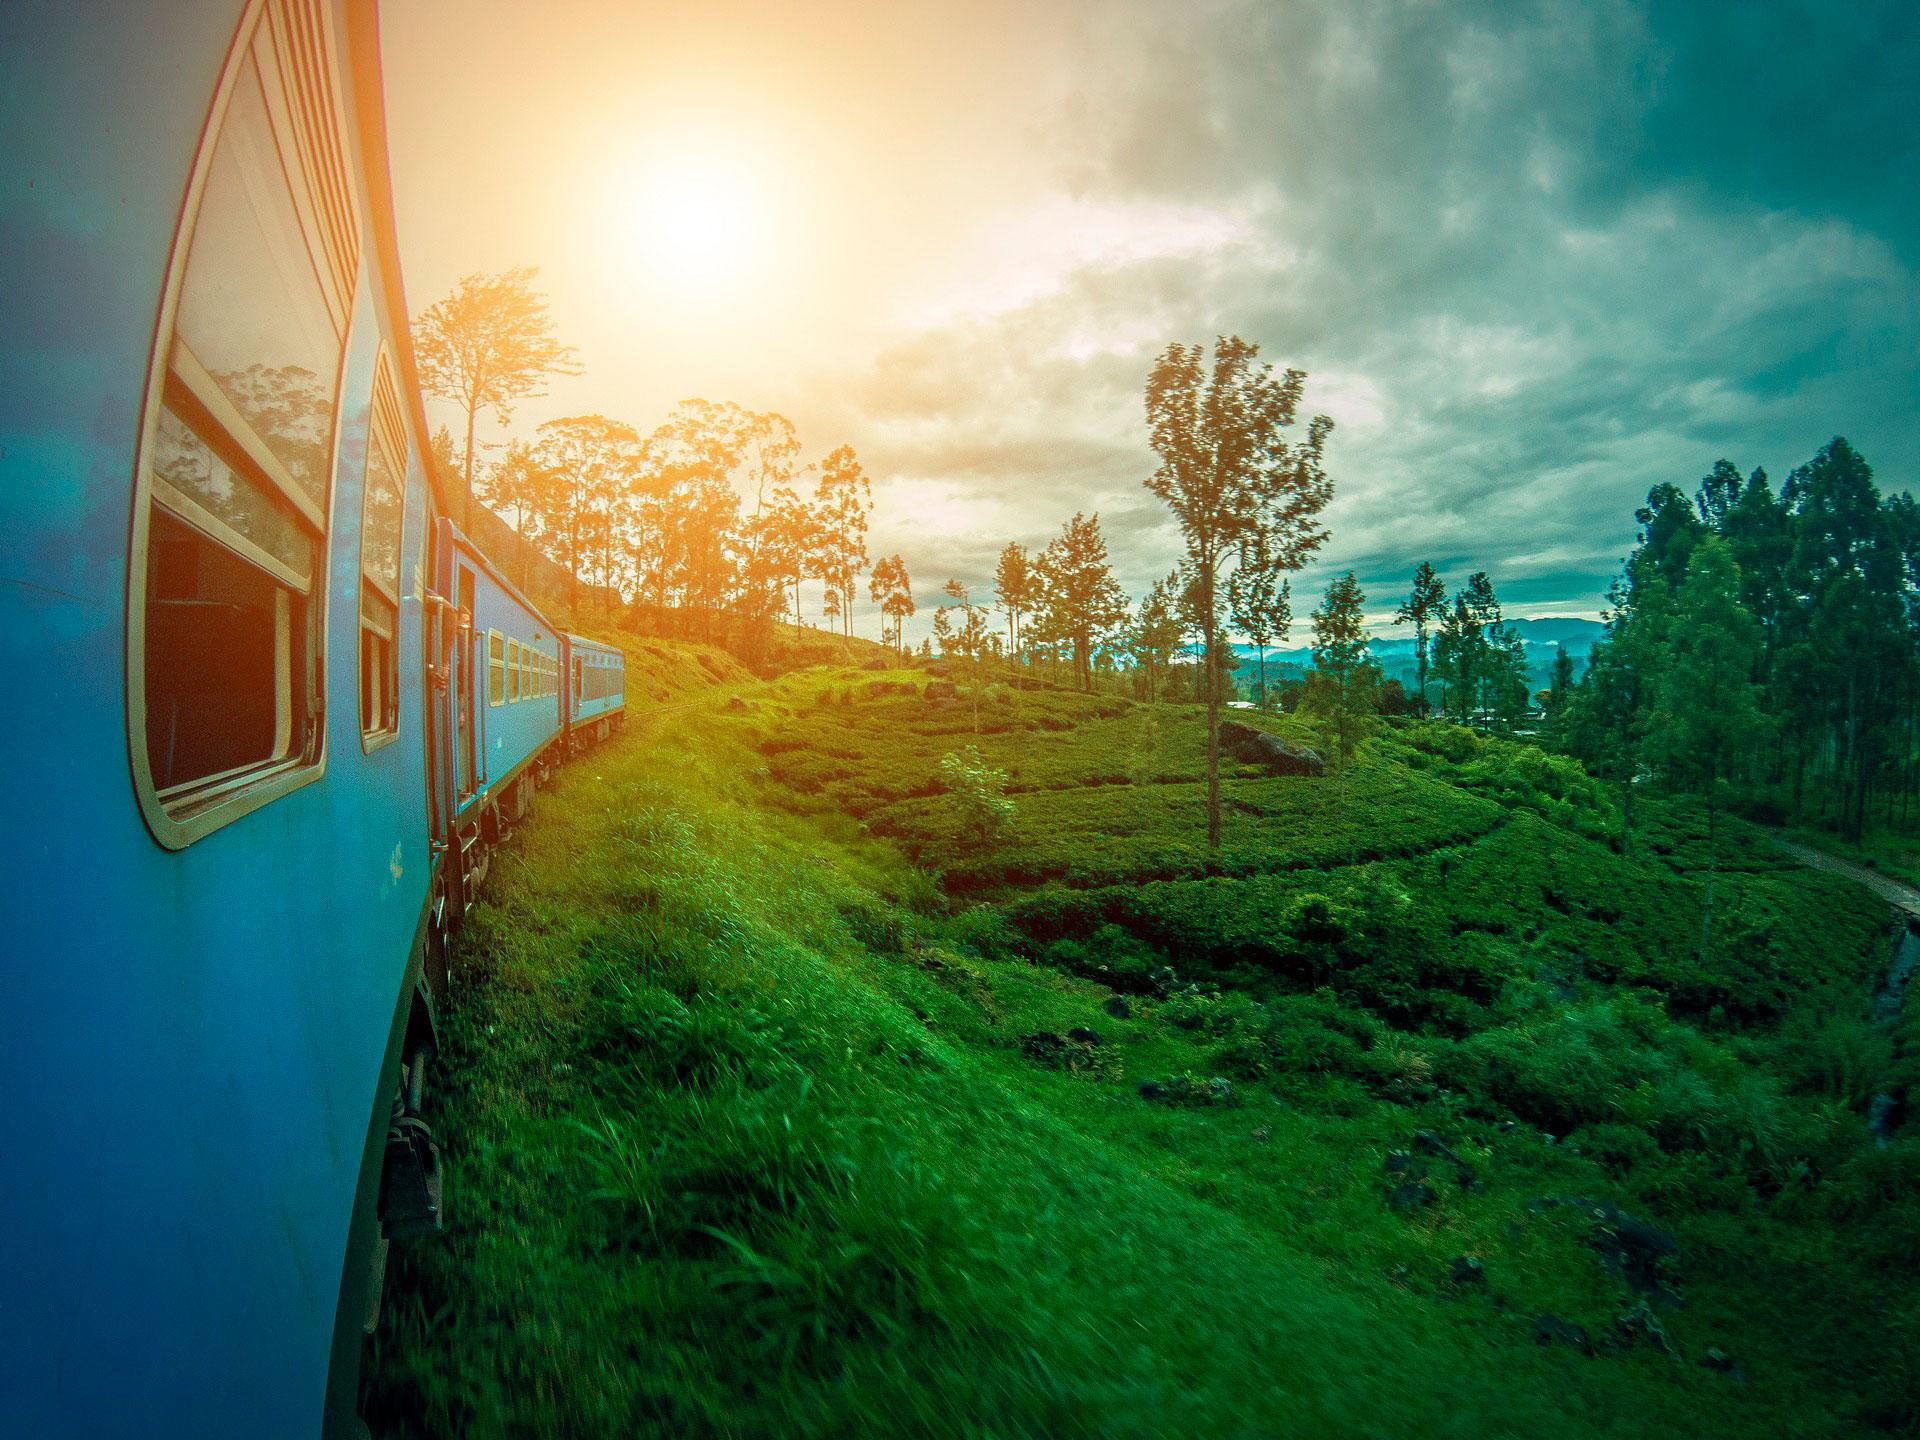 srilanka-2792097_1920-pixabay-small.jpg